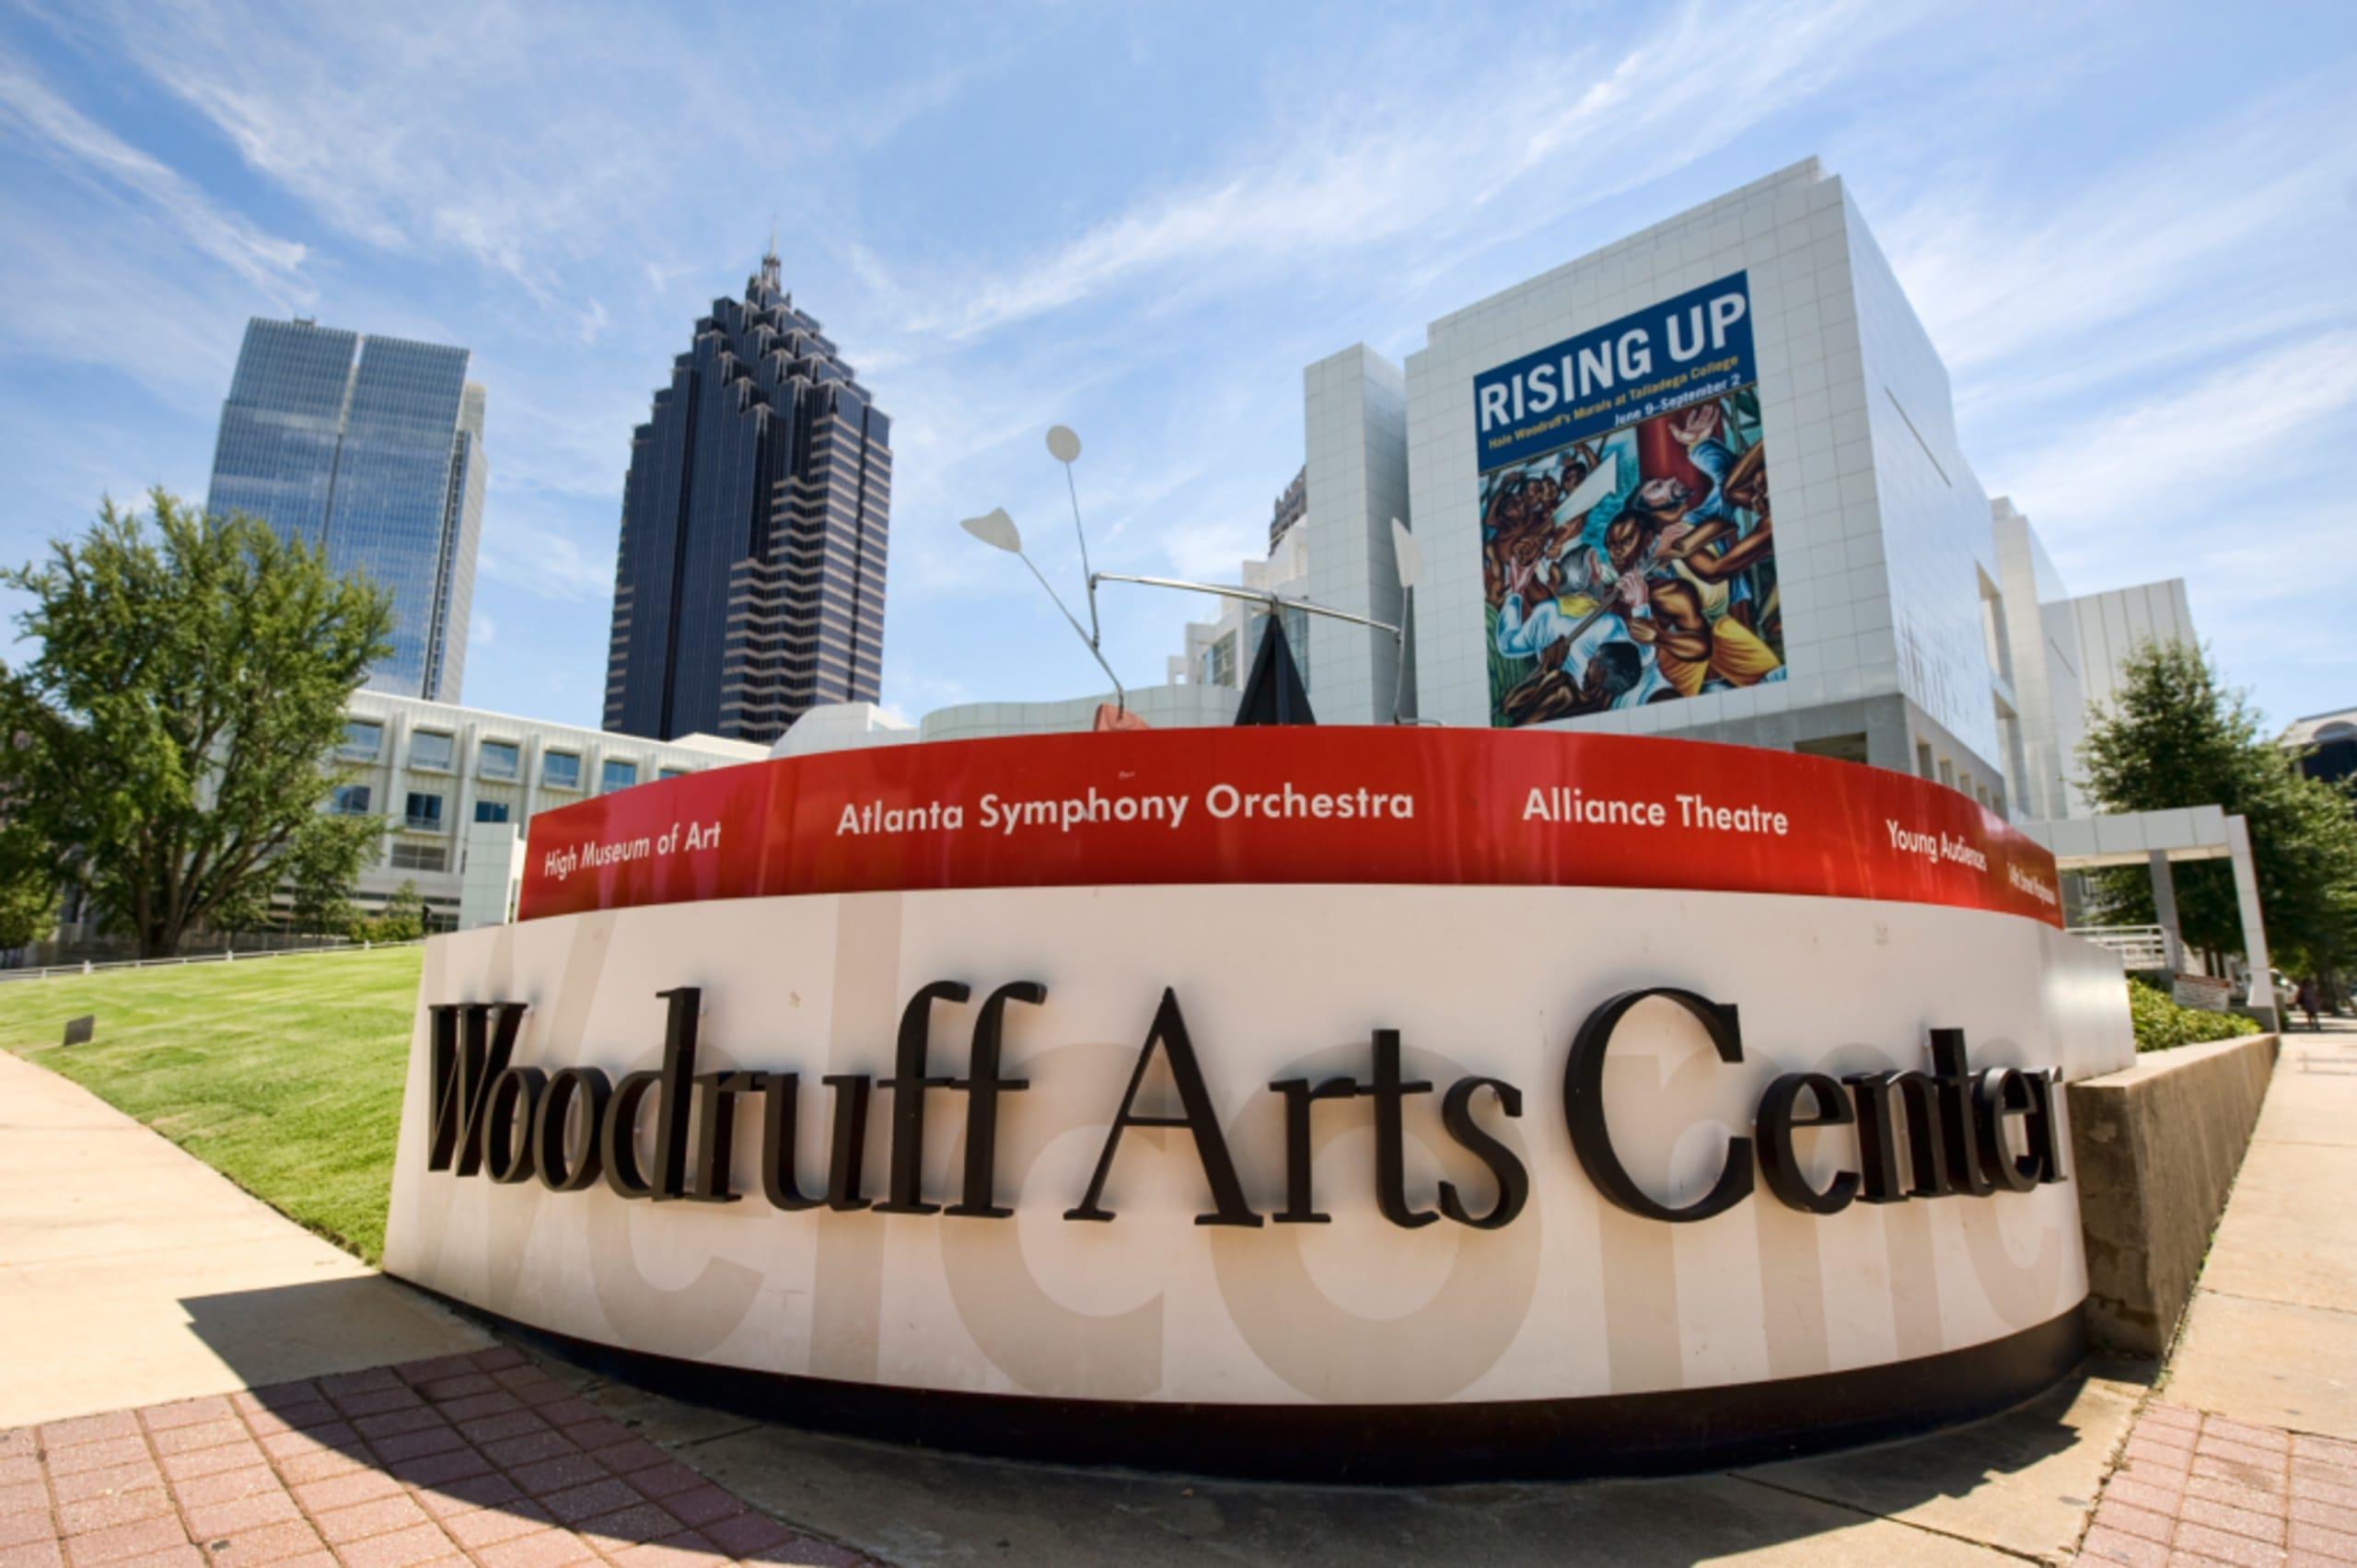 Woodruff Arts Center Exterior